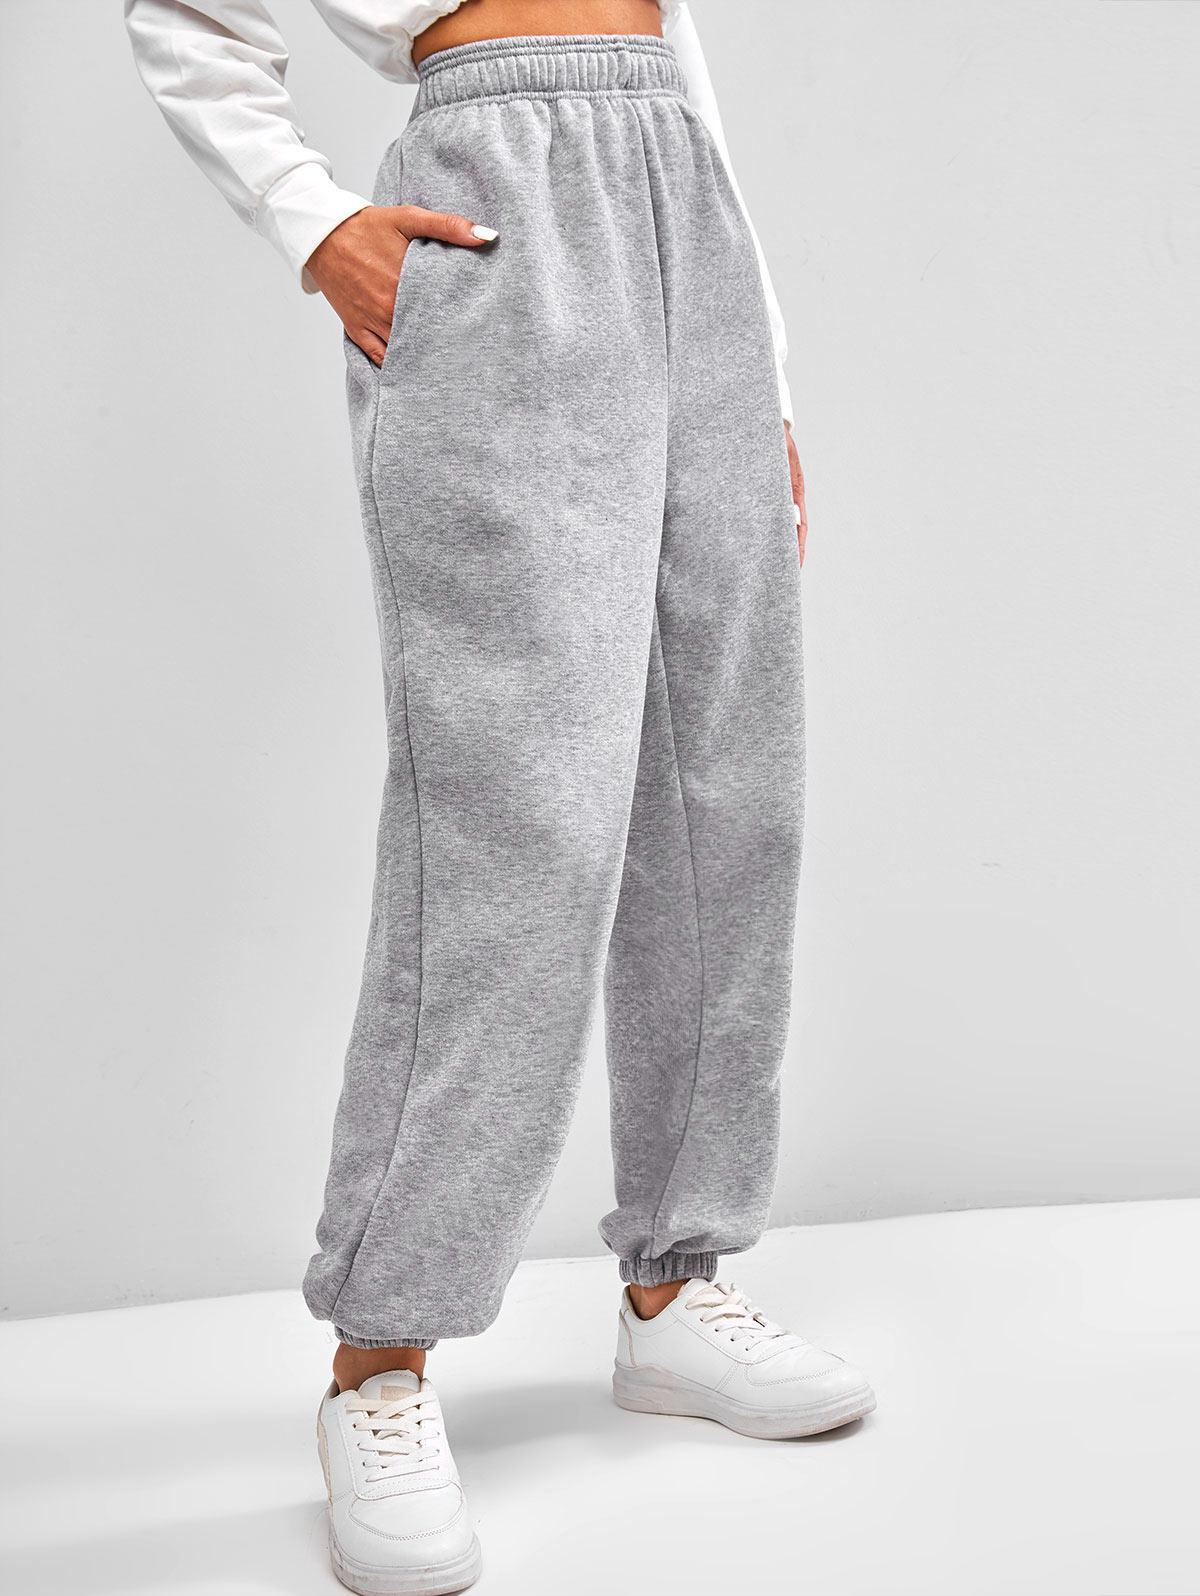 Fleece Lined Pocket Beam Feet High Rise Pants